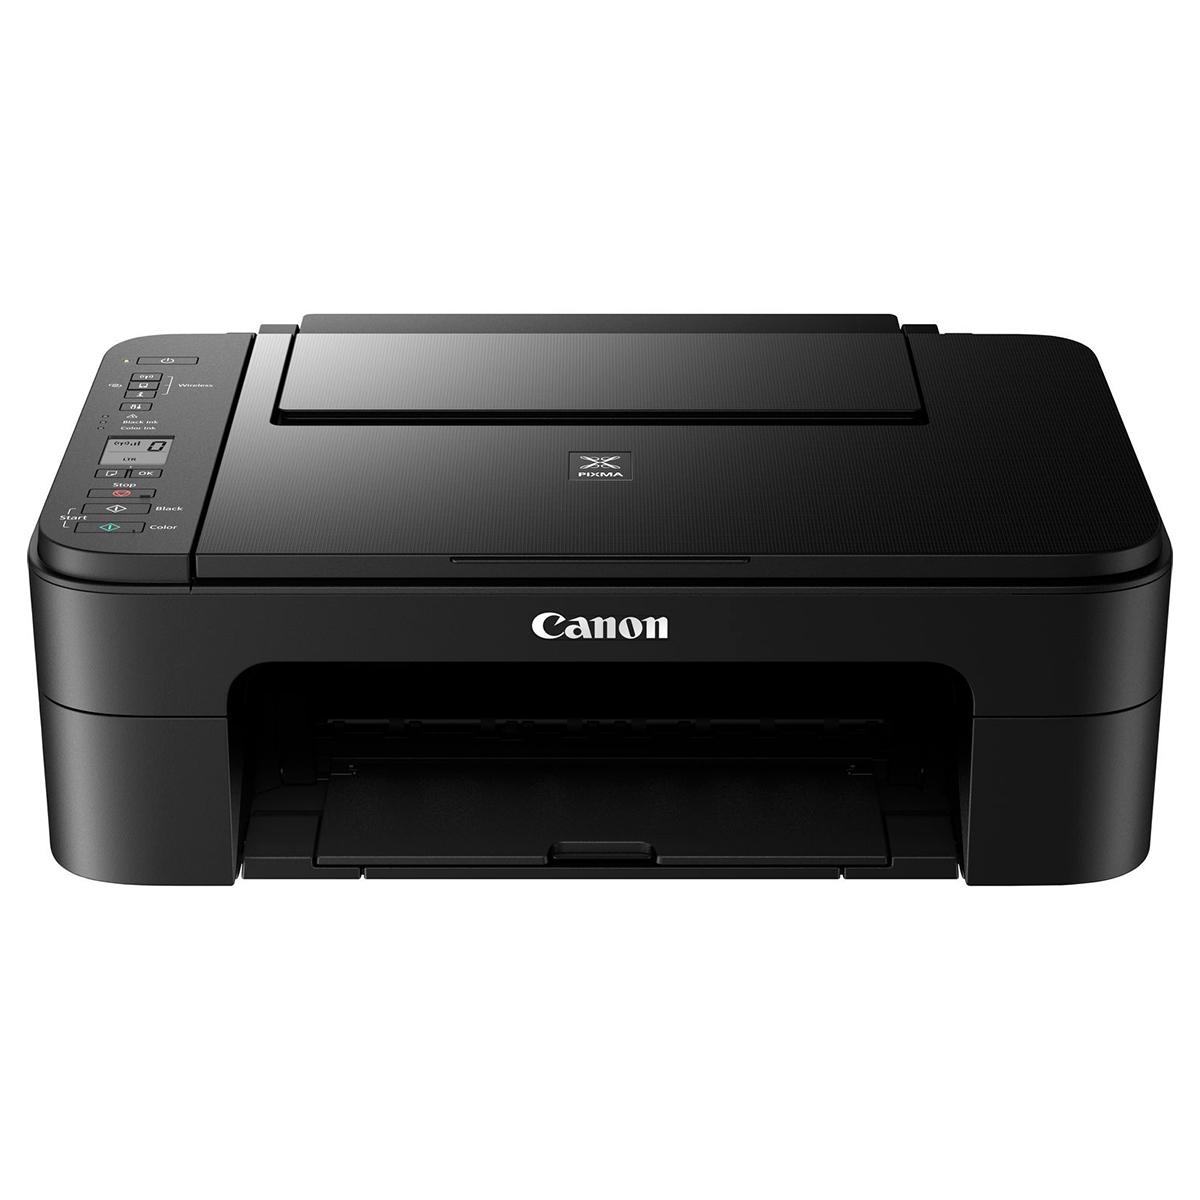 Canon PIXMA TS3350 A4 Colour Inkjet Multifunction